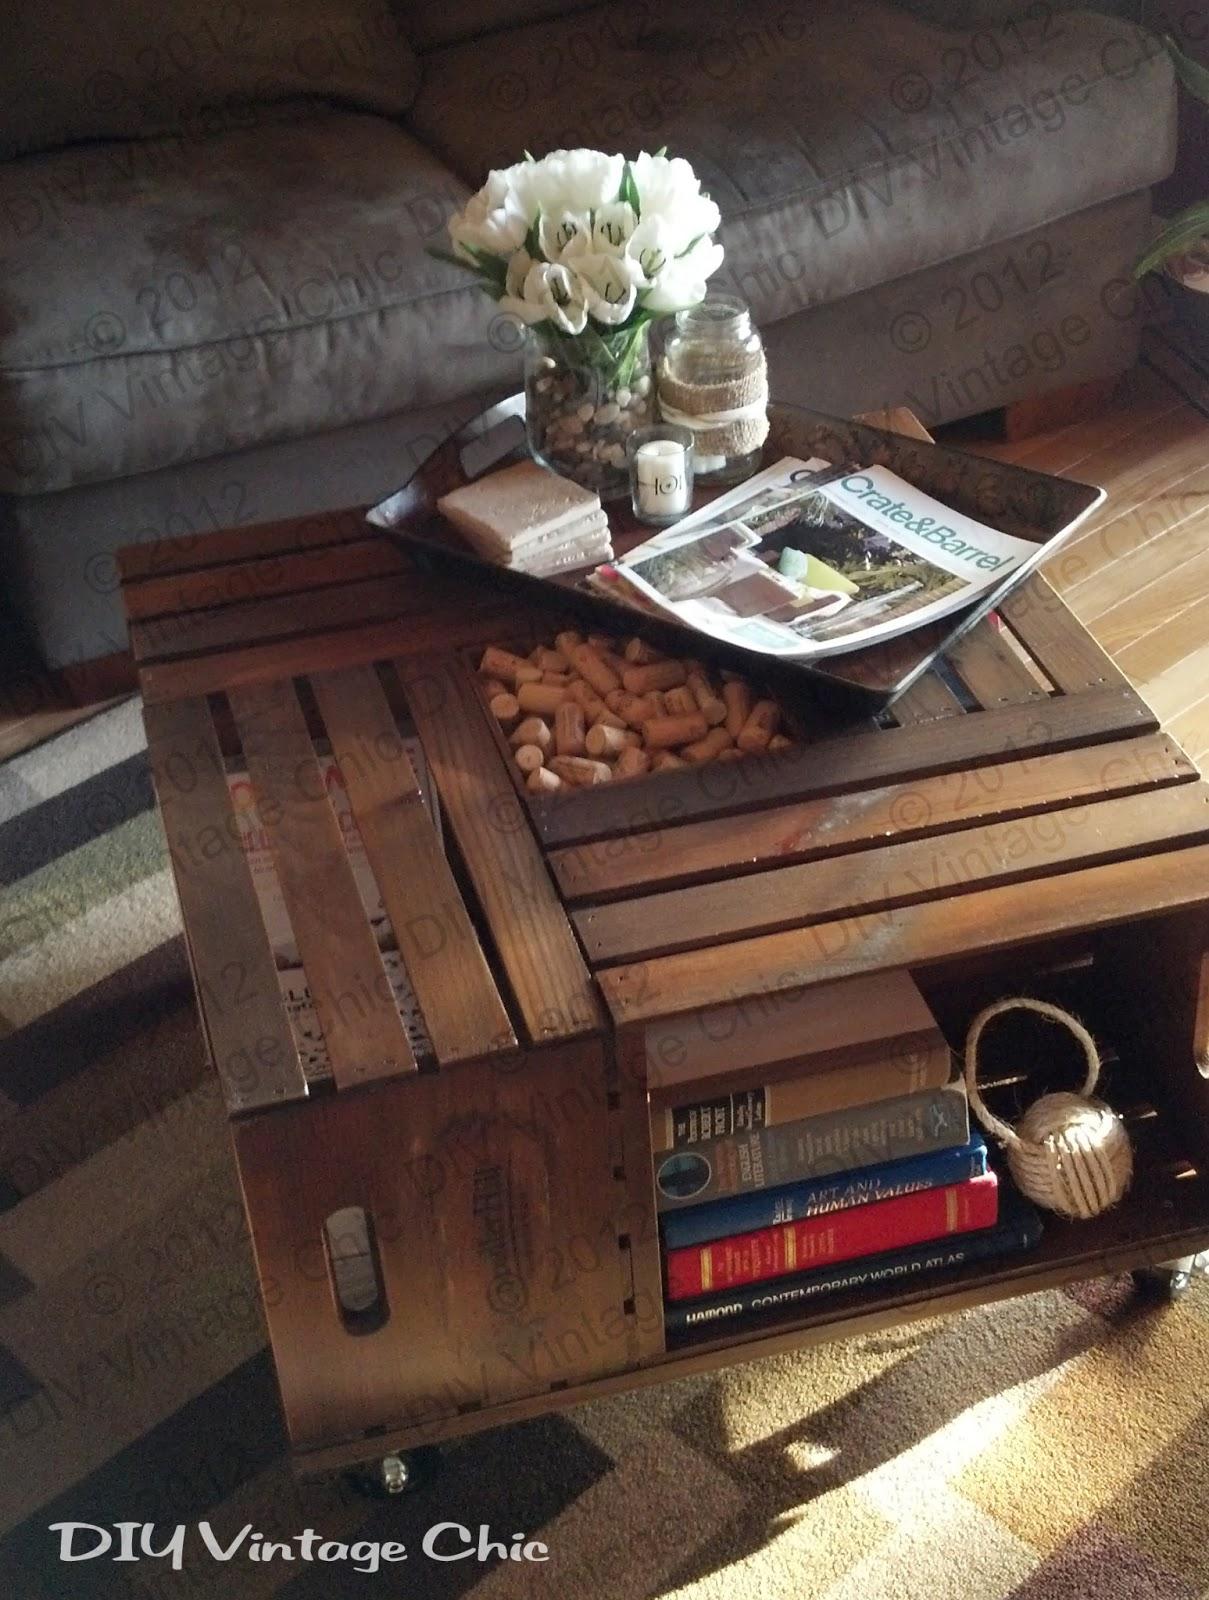 wood kitchen table sets wood kitchen table sets Wood kitchen table sets Photo 4